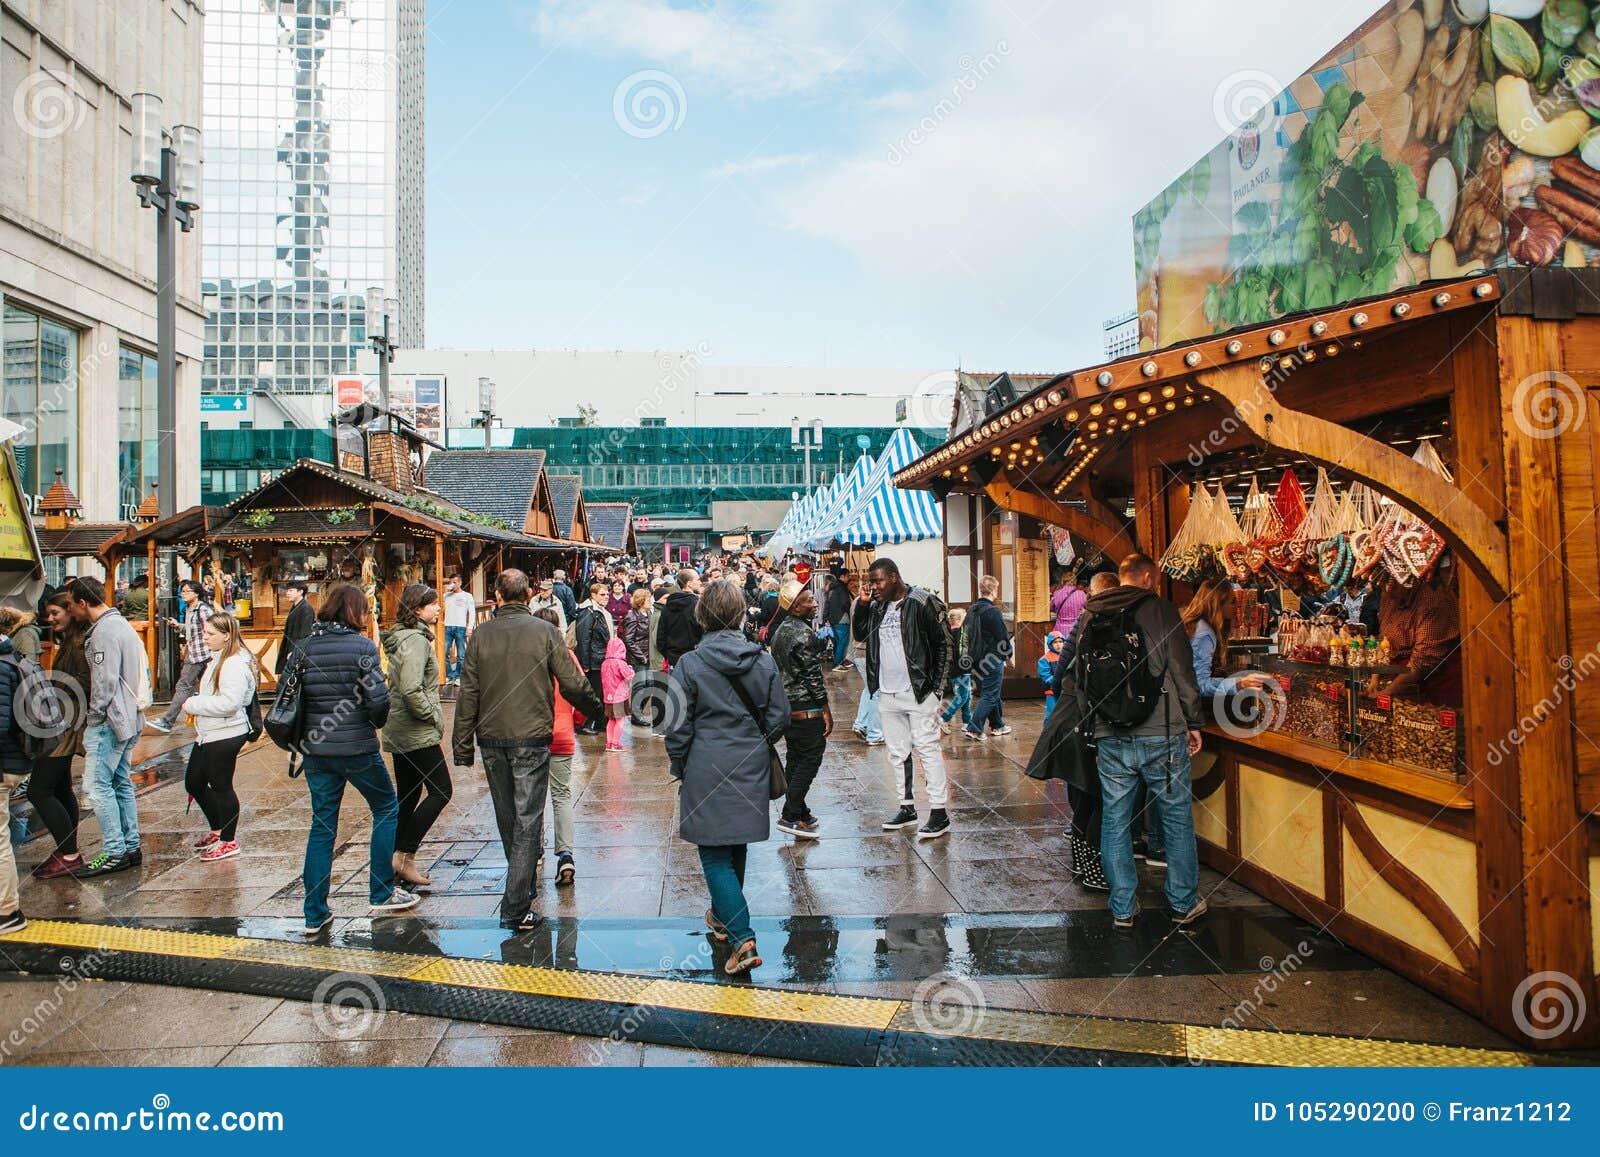 Berlin, October 03, 2017: Celebrating the Oktoberfest. People walk on the street market on the famous Alexanderplatz